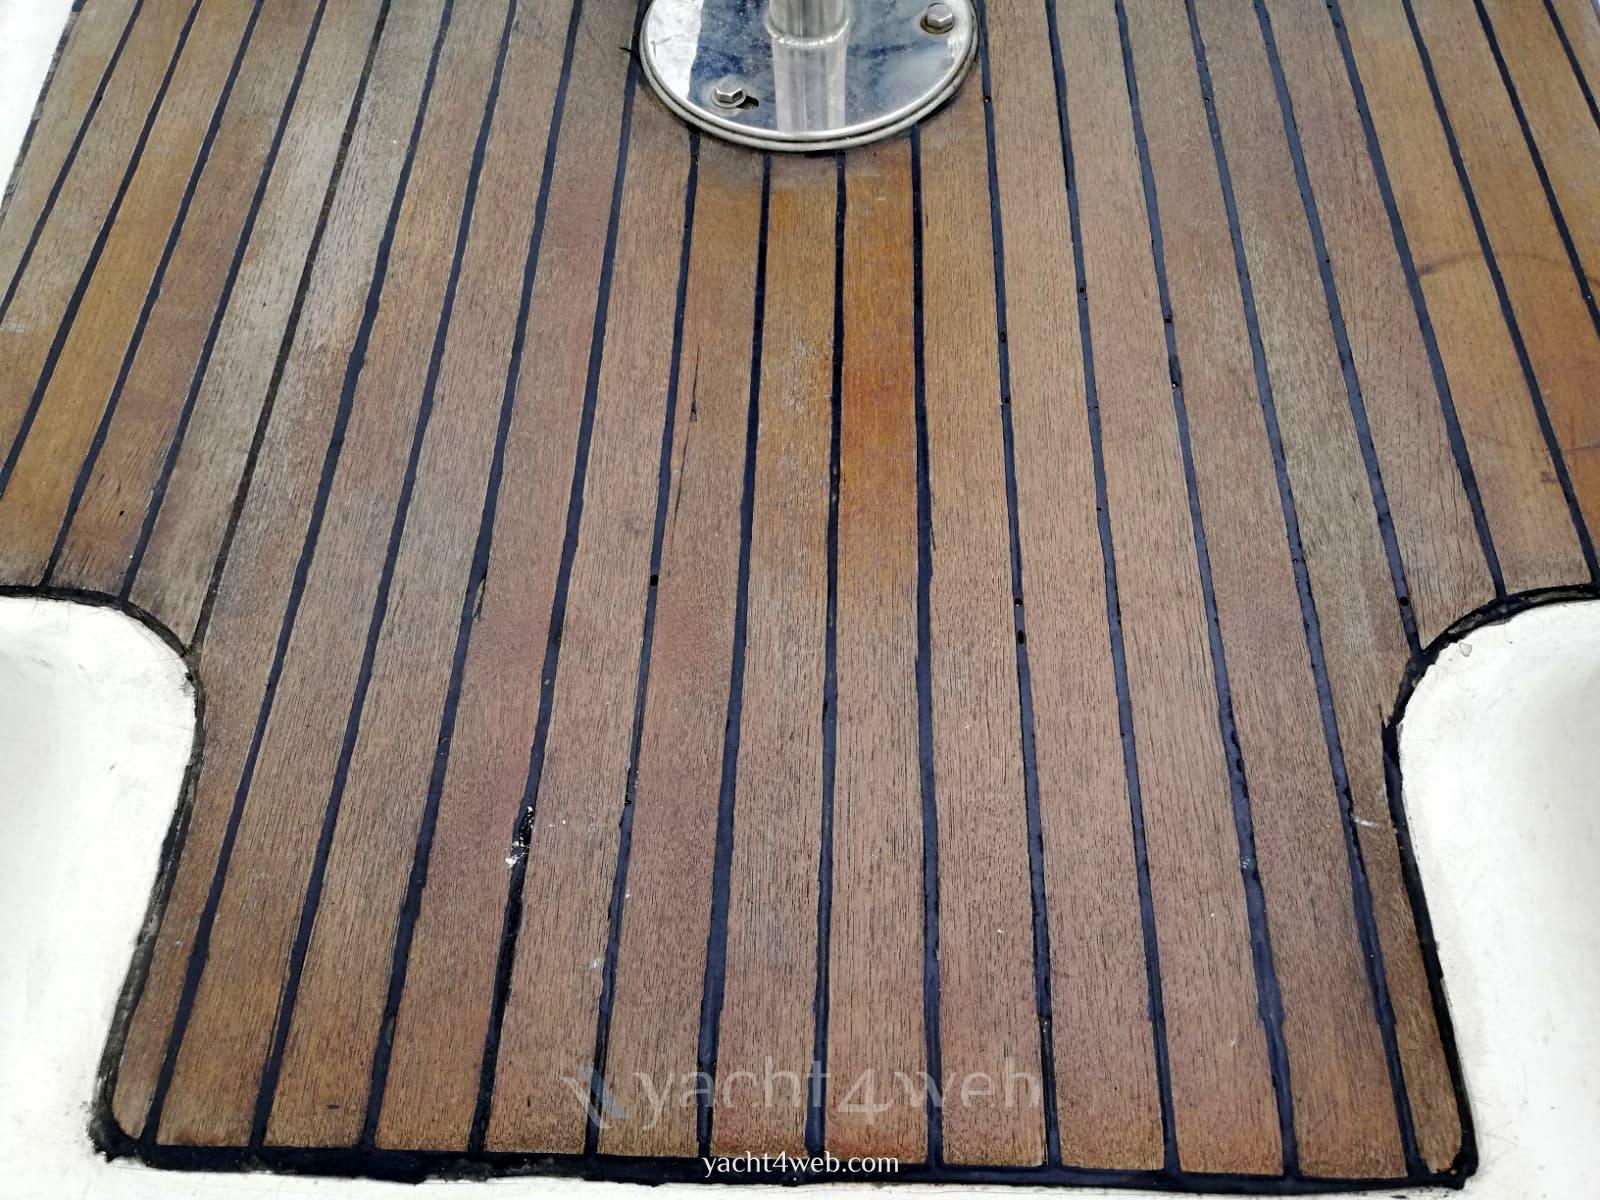 Dufour Yachts 385 grand large Exterior: detail